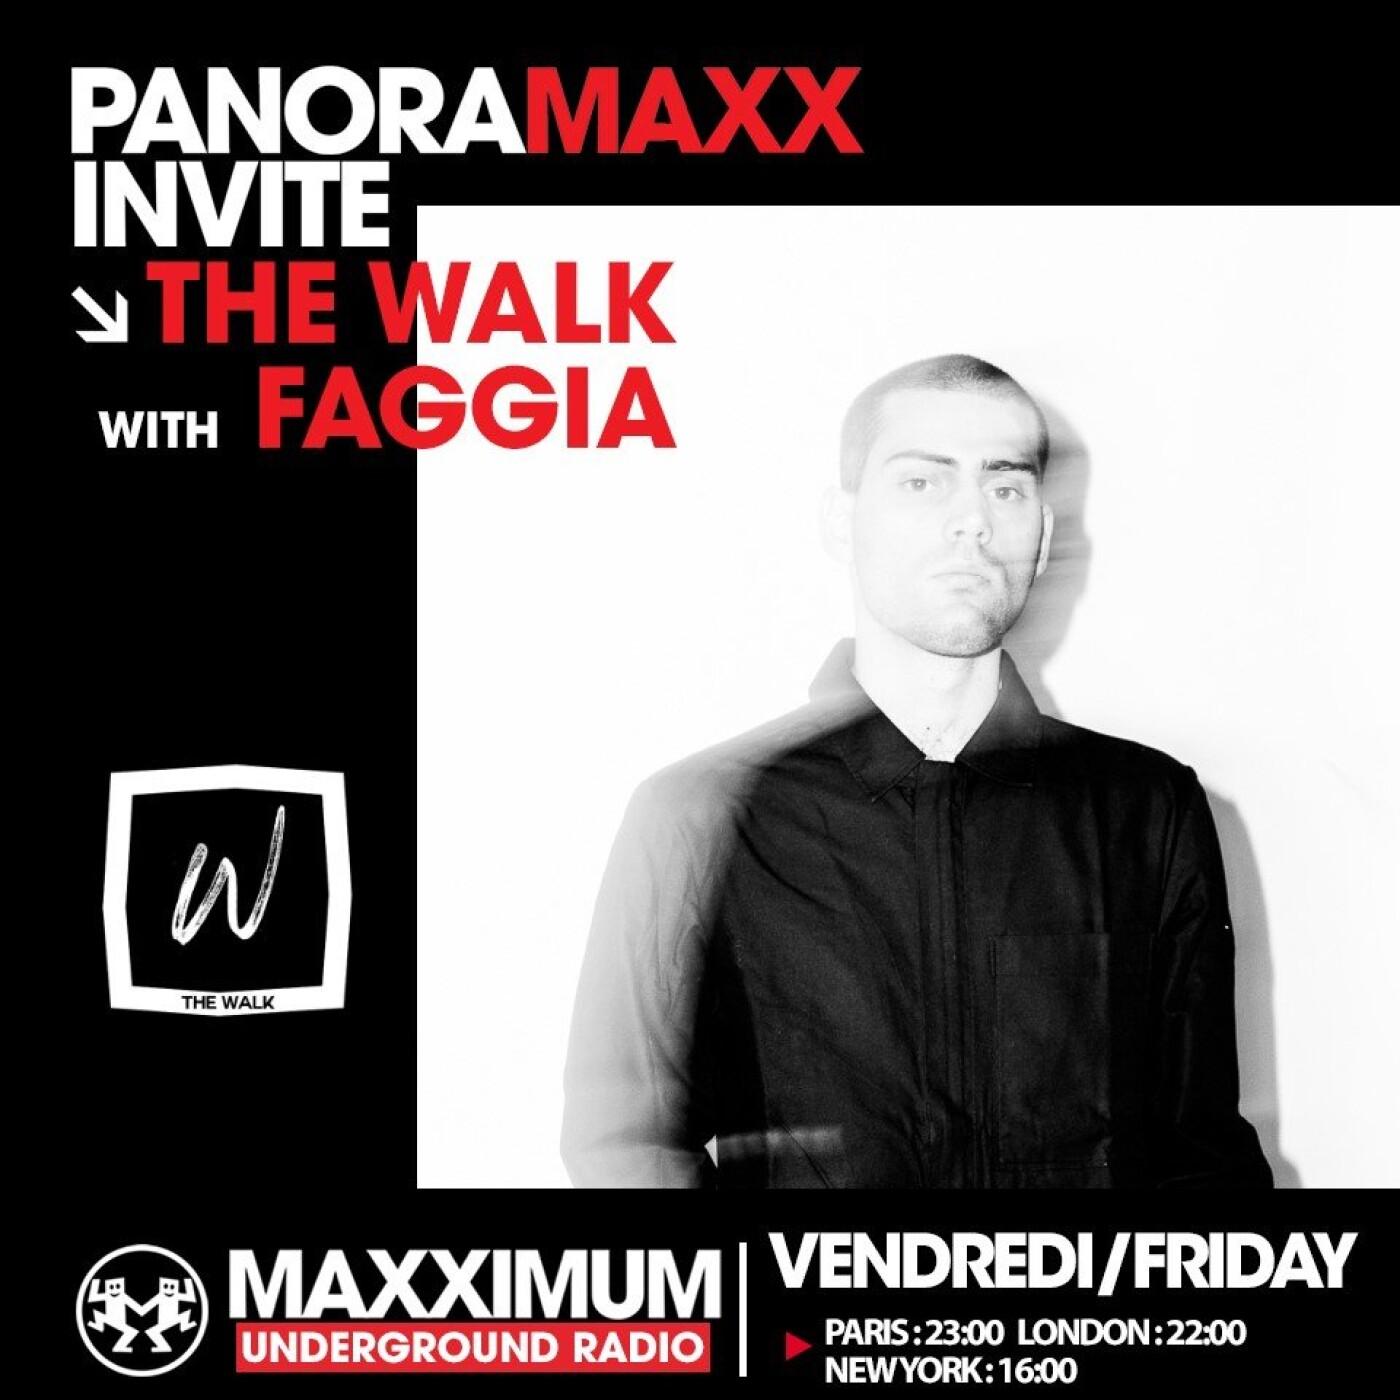 PANORAMAXX : FAGGIA